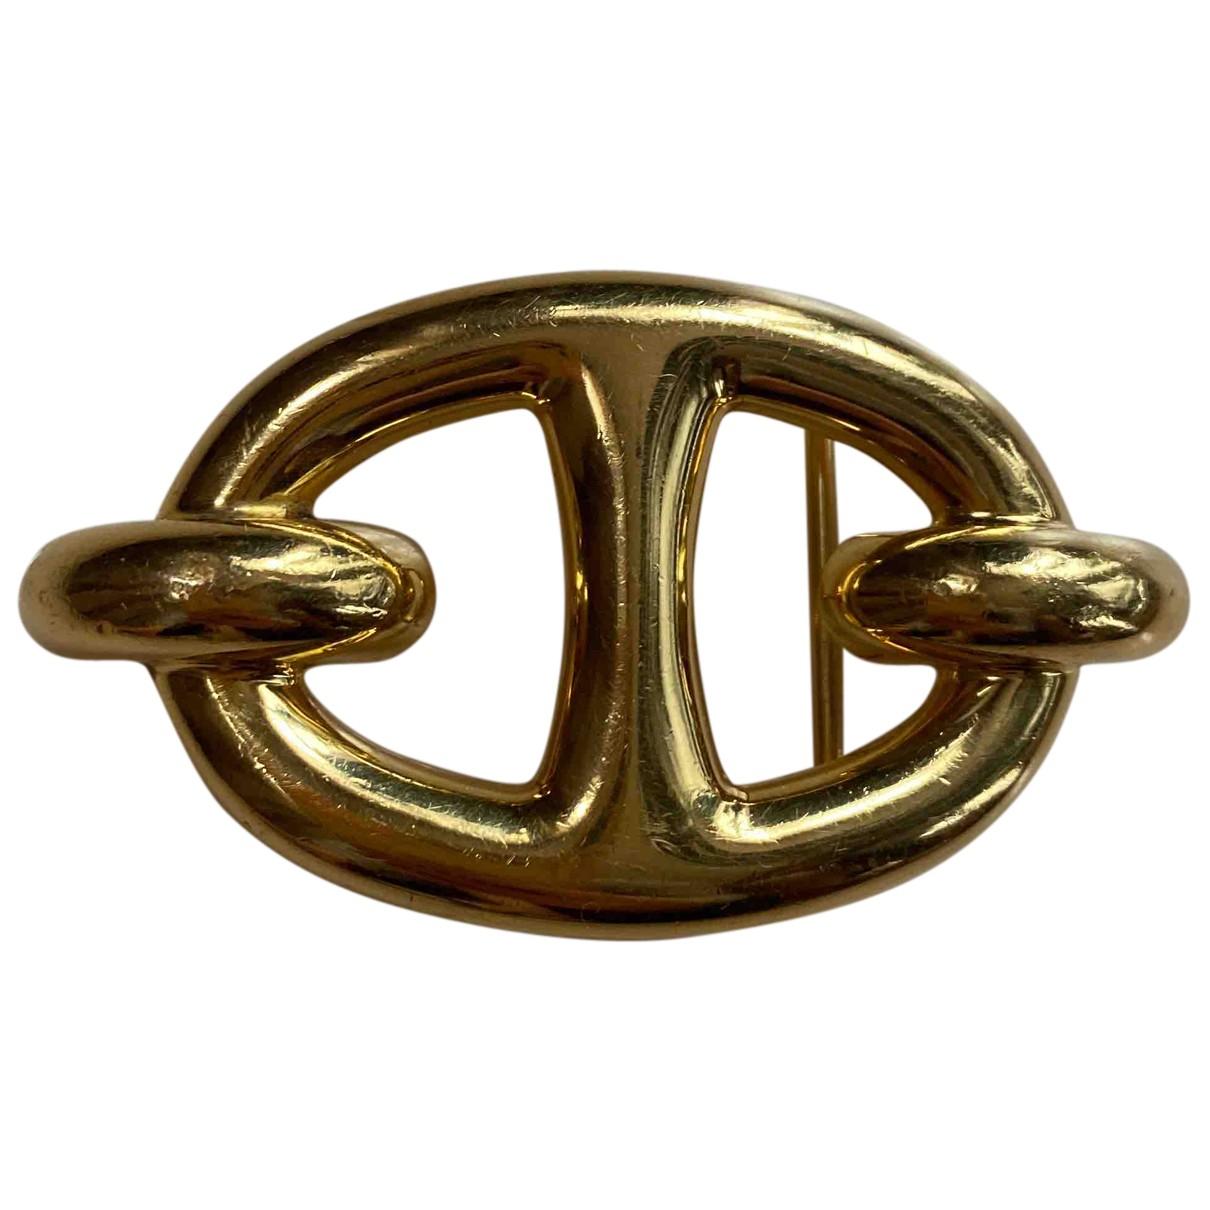 Hermes \N Anhaenger in  Gold Metall